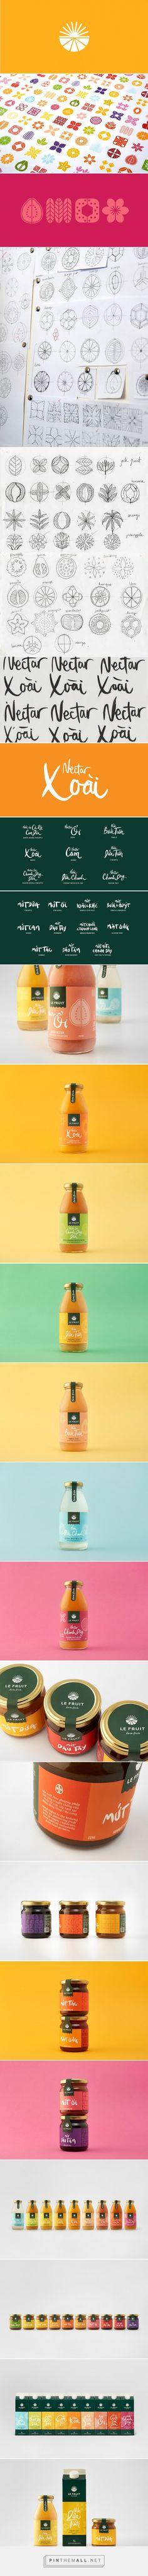 Le Fruit packaging design by Rice-Creative (Vietnam) - http://www.packagingoftheworld.com/2016/06/le-fruit.html